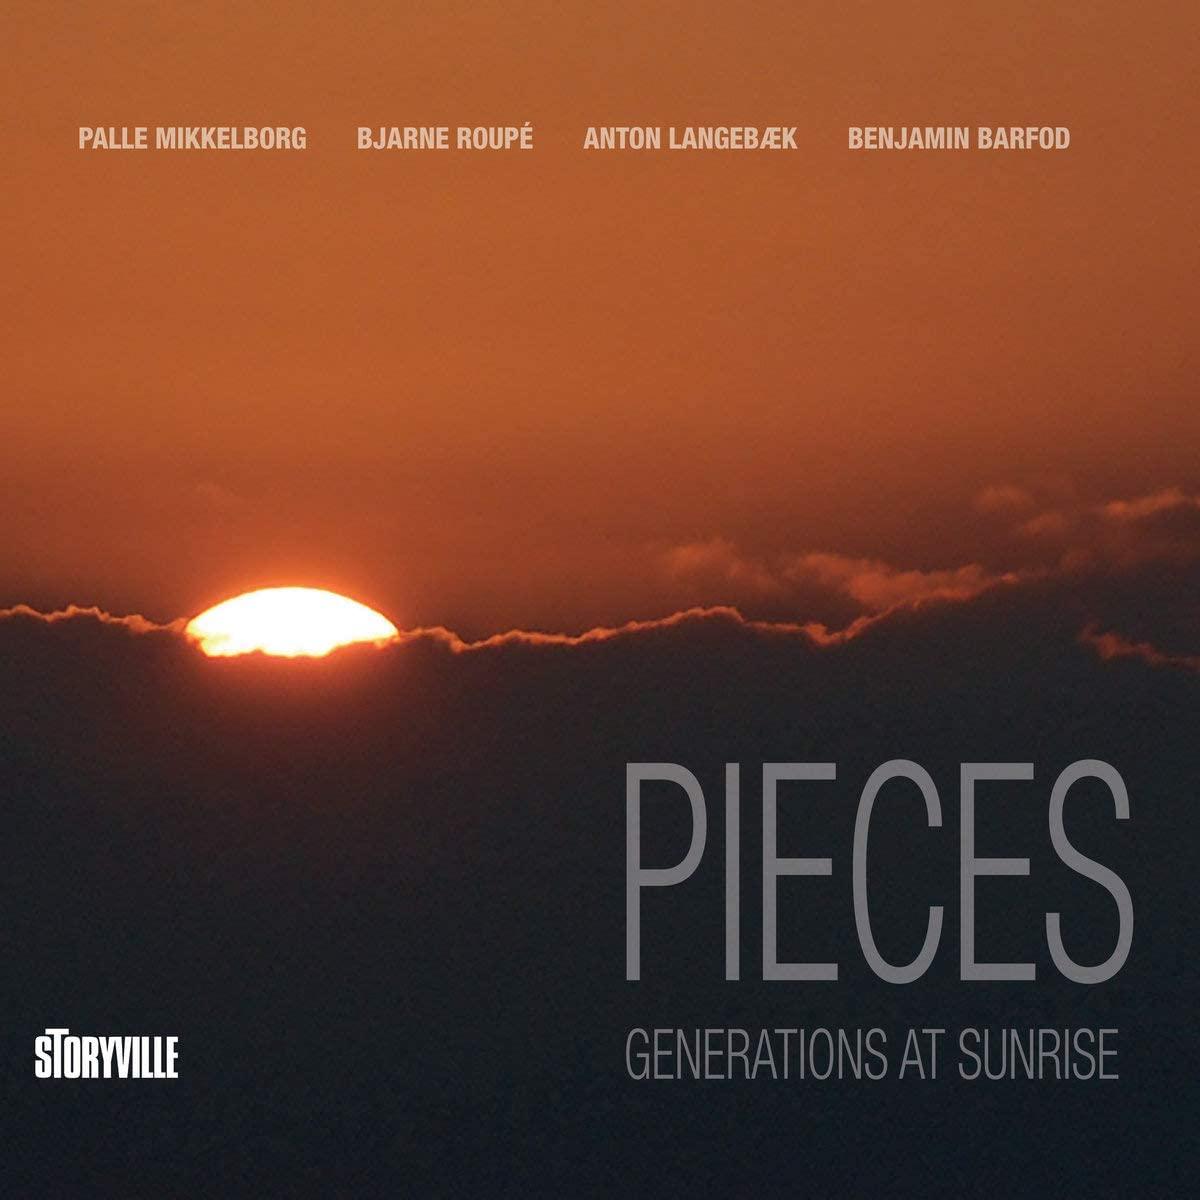 PALLE MIKKELBORG - Pieces : Generations At Sunrise cover